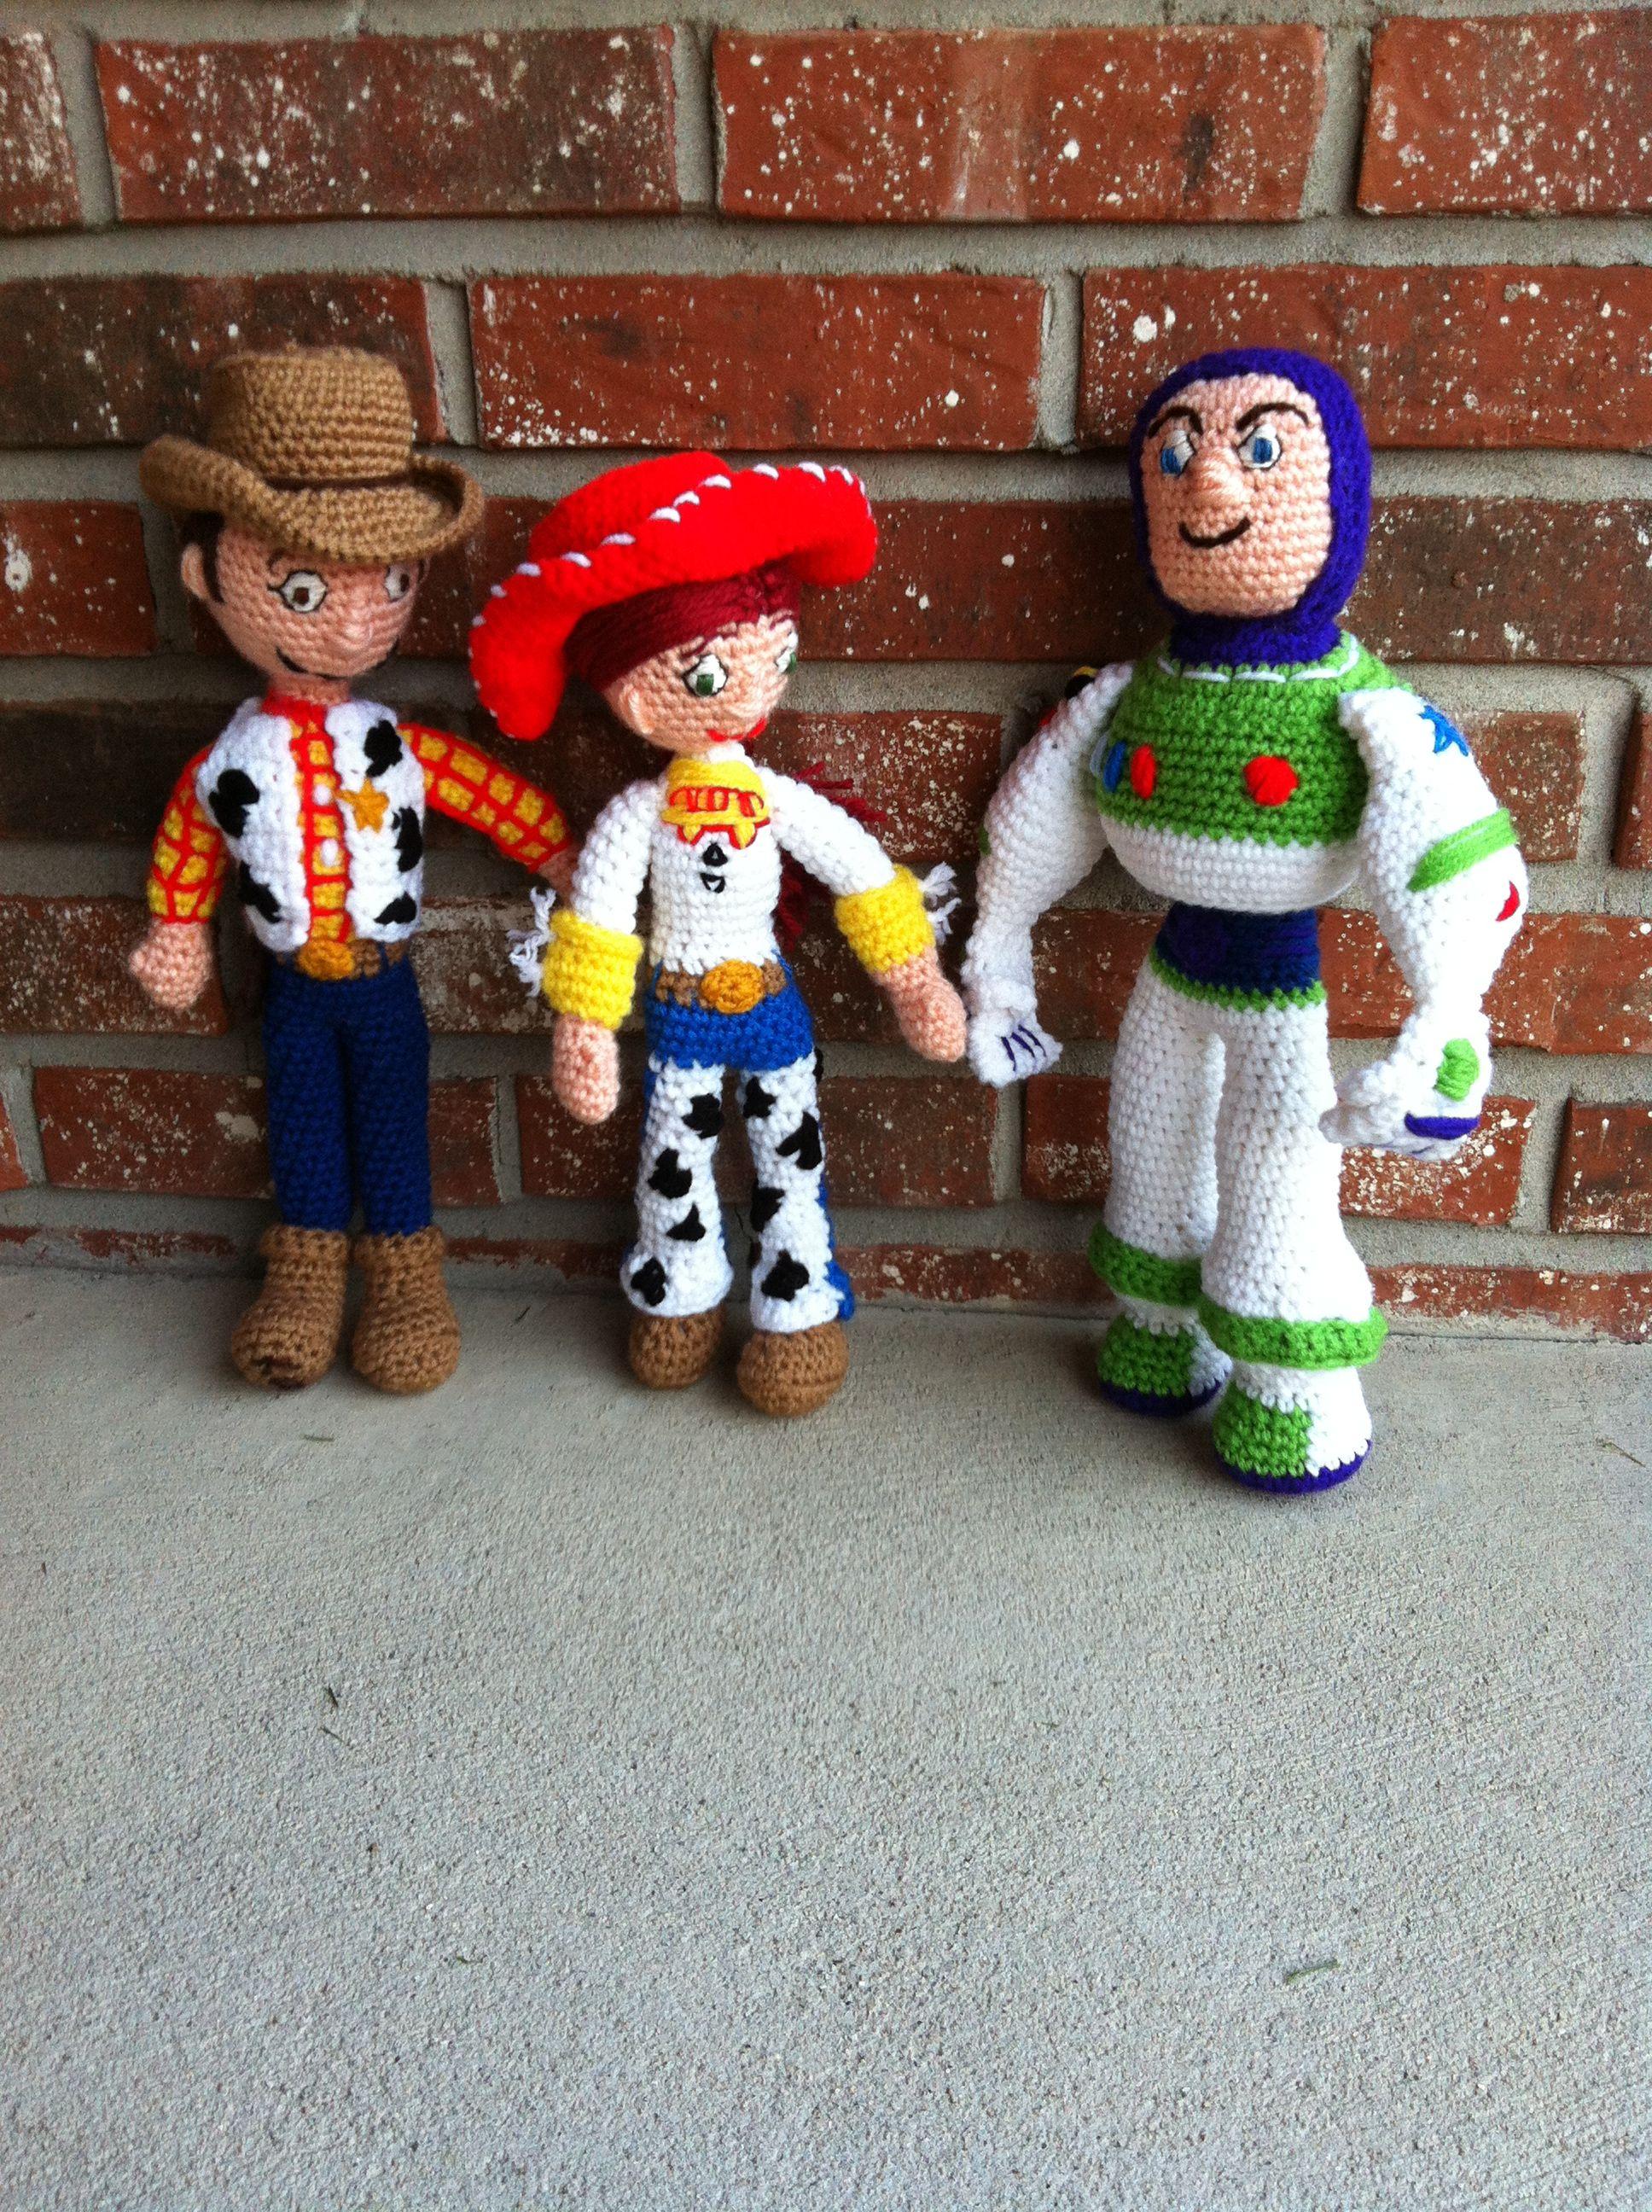 Toy Story Knitting Patterns Woody : Toy Story crochet - Woody, Jessie & Buzz Amigurumi Pinterest Woody